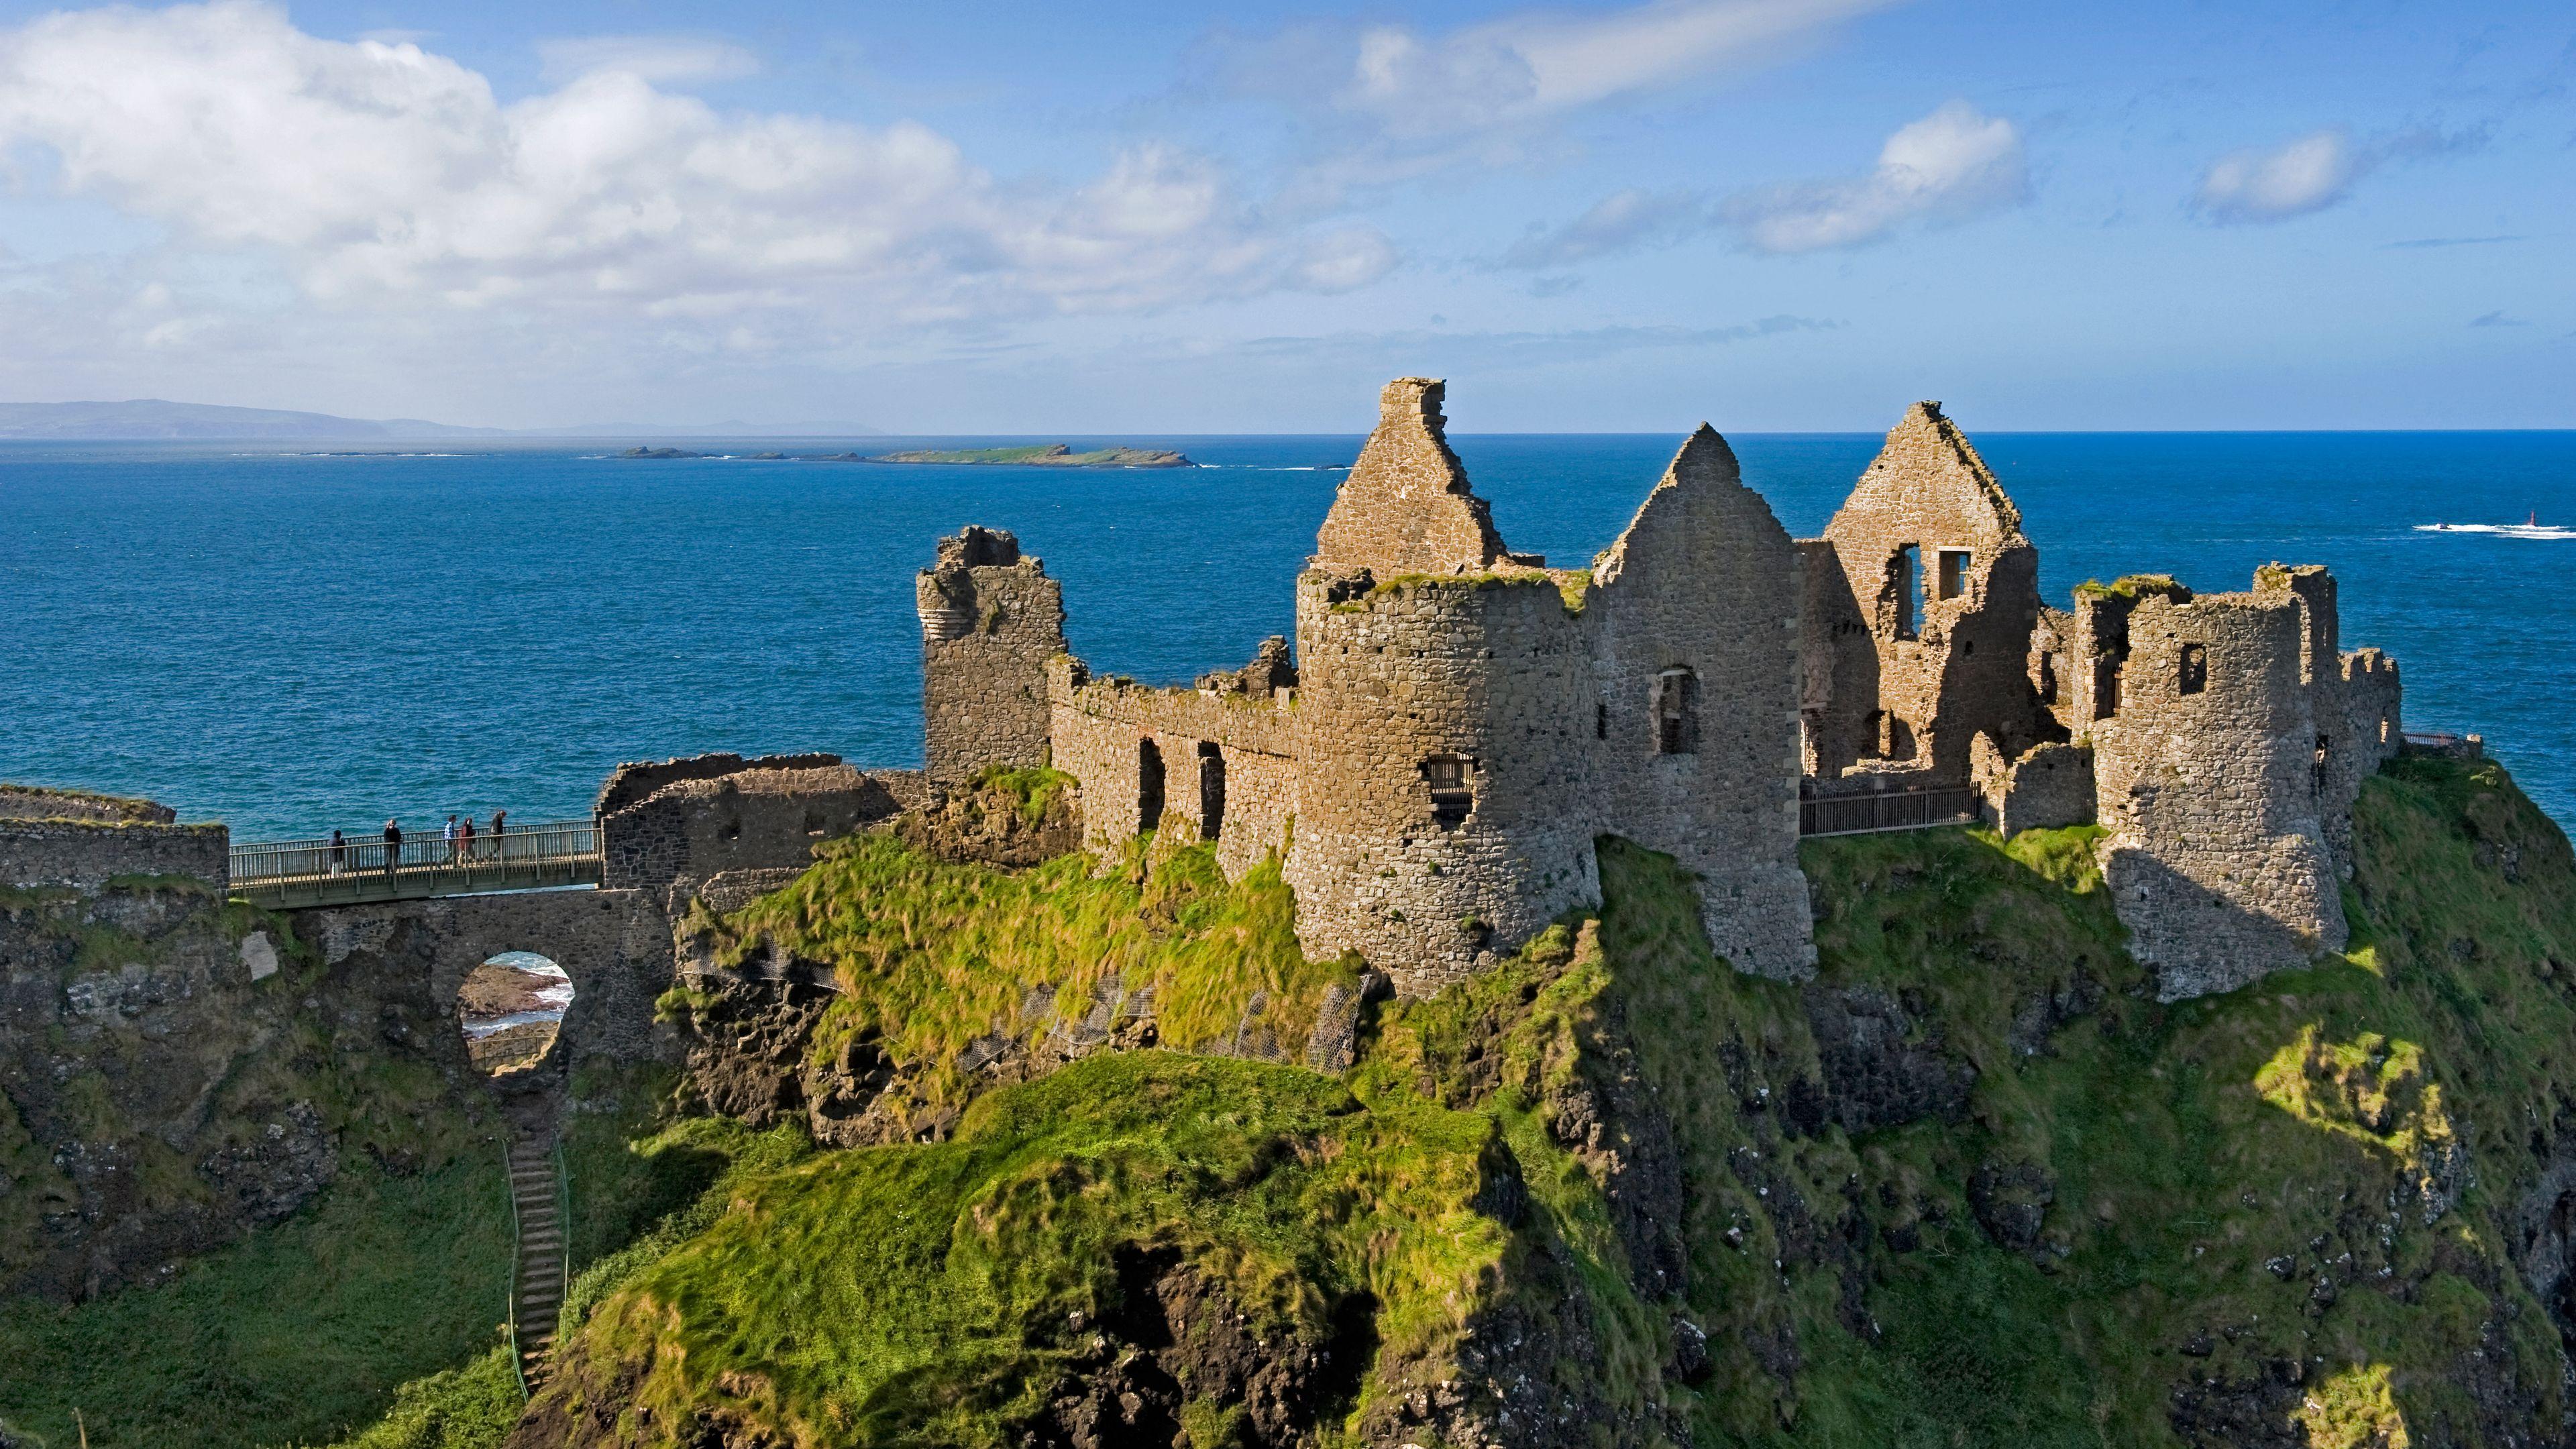 ruins of castle in ireland